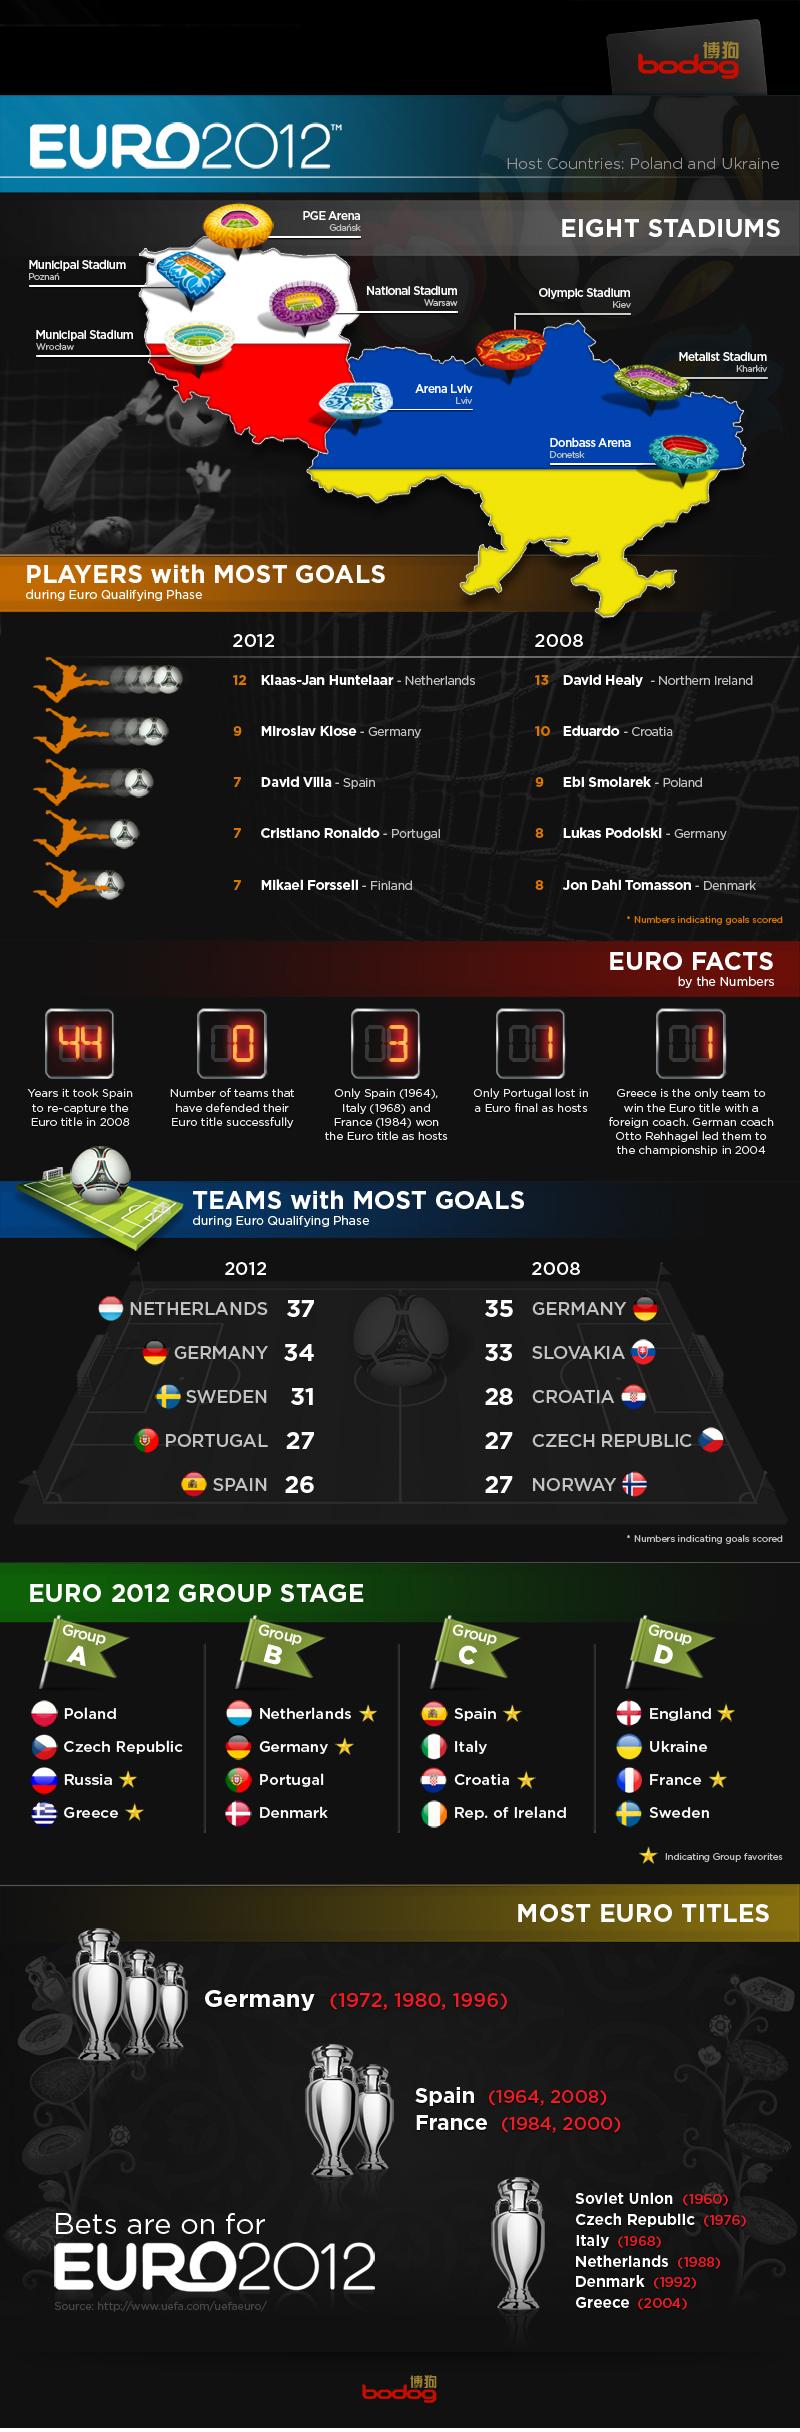 Best European Betting Sites Bet In Euros